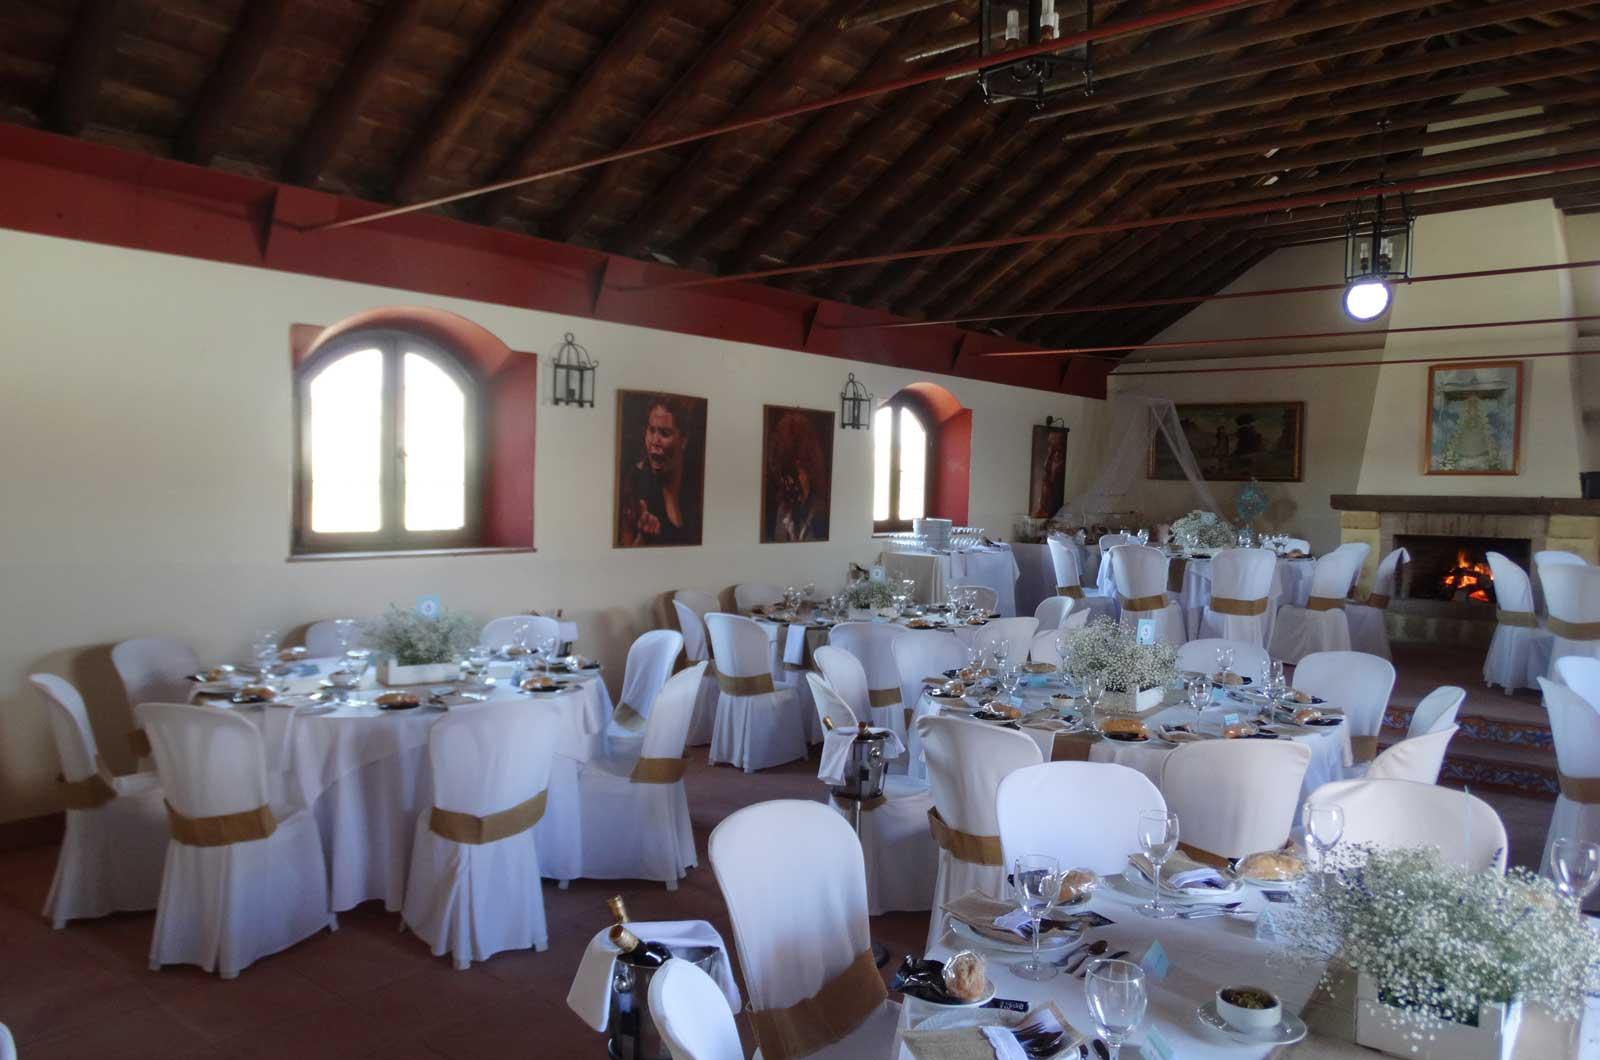 Hacienda el Caracol - salón interior<div style='clear:both;width:100%;height:0px;'></div><span class='cat'>Cortijo El Caracol</span><div style='clear:both;width:100%;height:0px;'></div><span class='desc'>Hacienda el Caracol - salón interior</span>